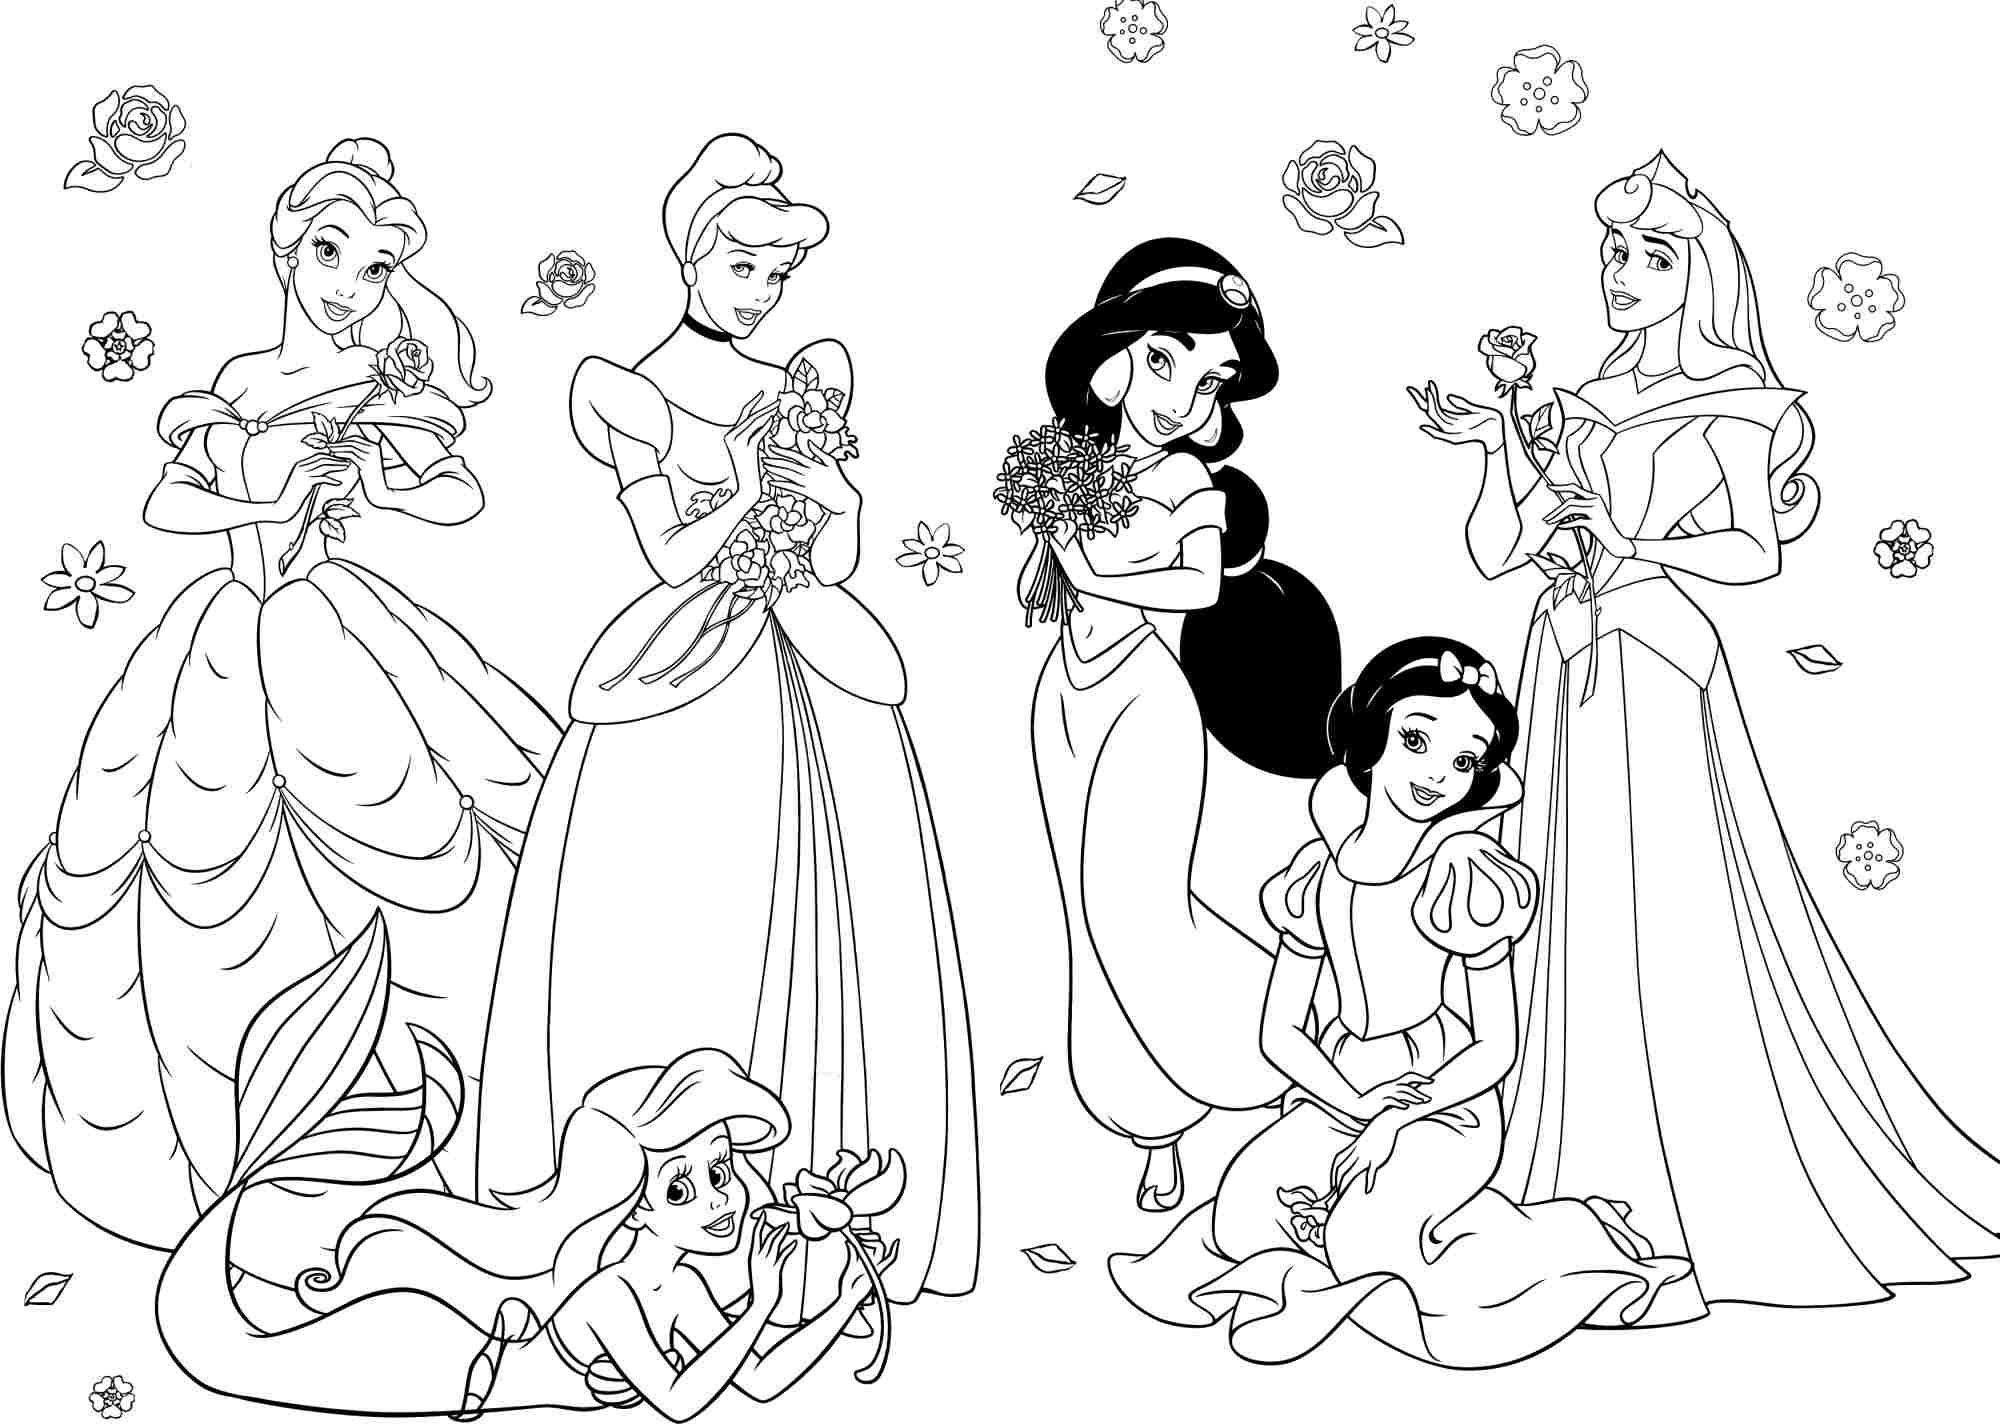 Disney Coloring Pages Princess disney coloring pages princess